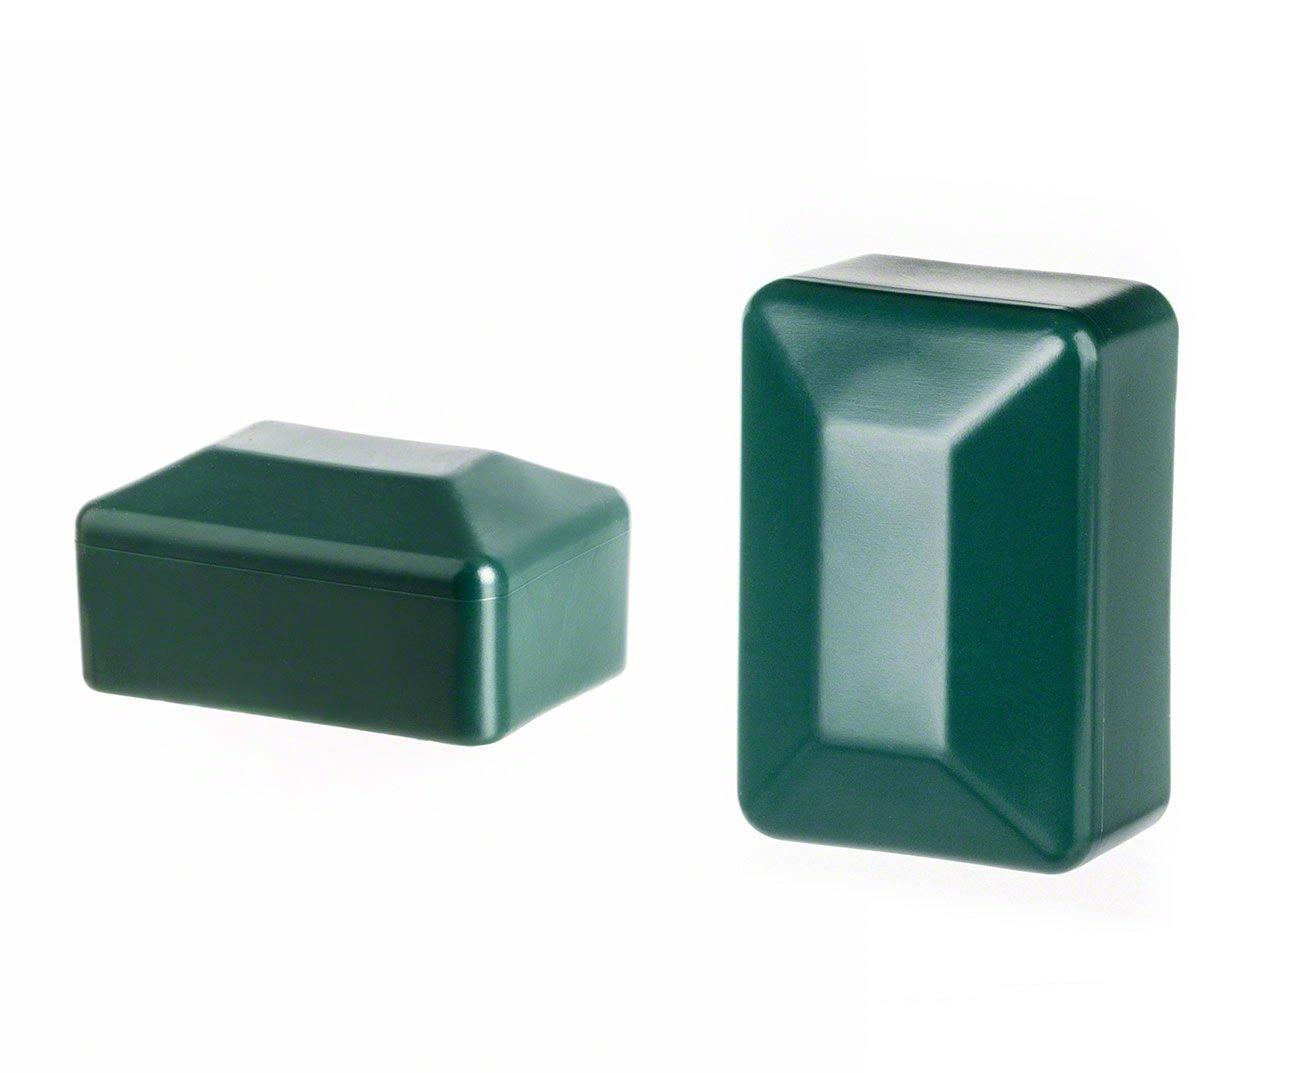 Zaunpfahlkappe quadratisch 100x100 mm Schwarz Zaunpfostenkappen Zaunabdeckung Kunststoff 10 Stck